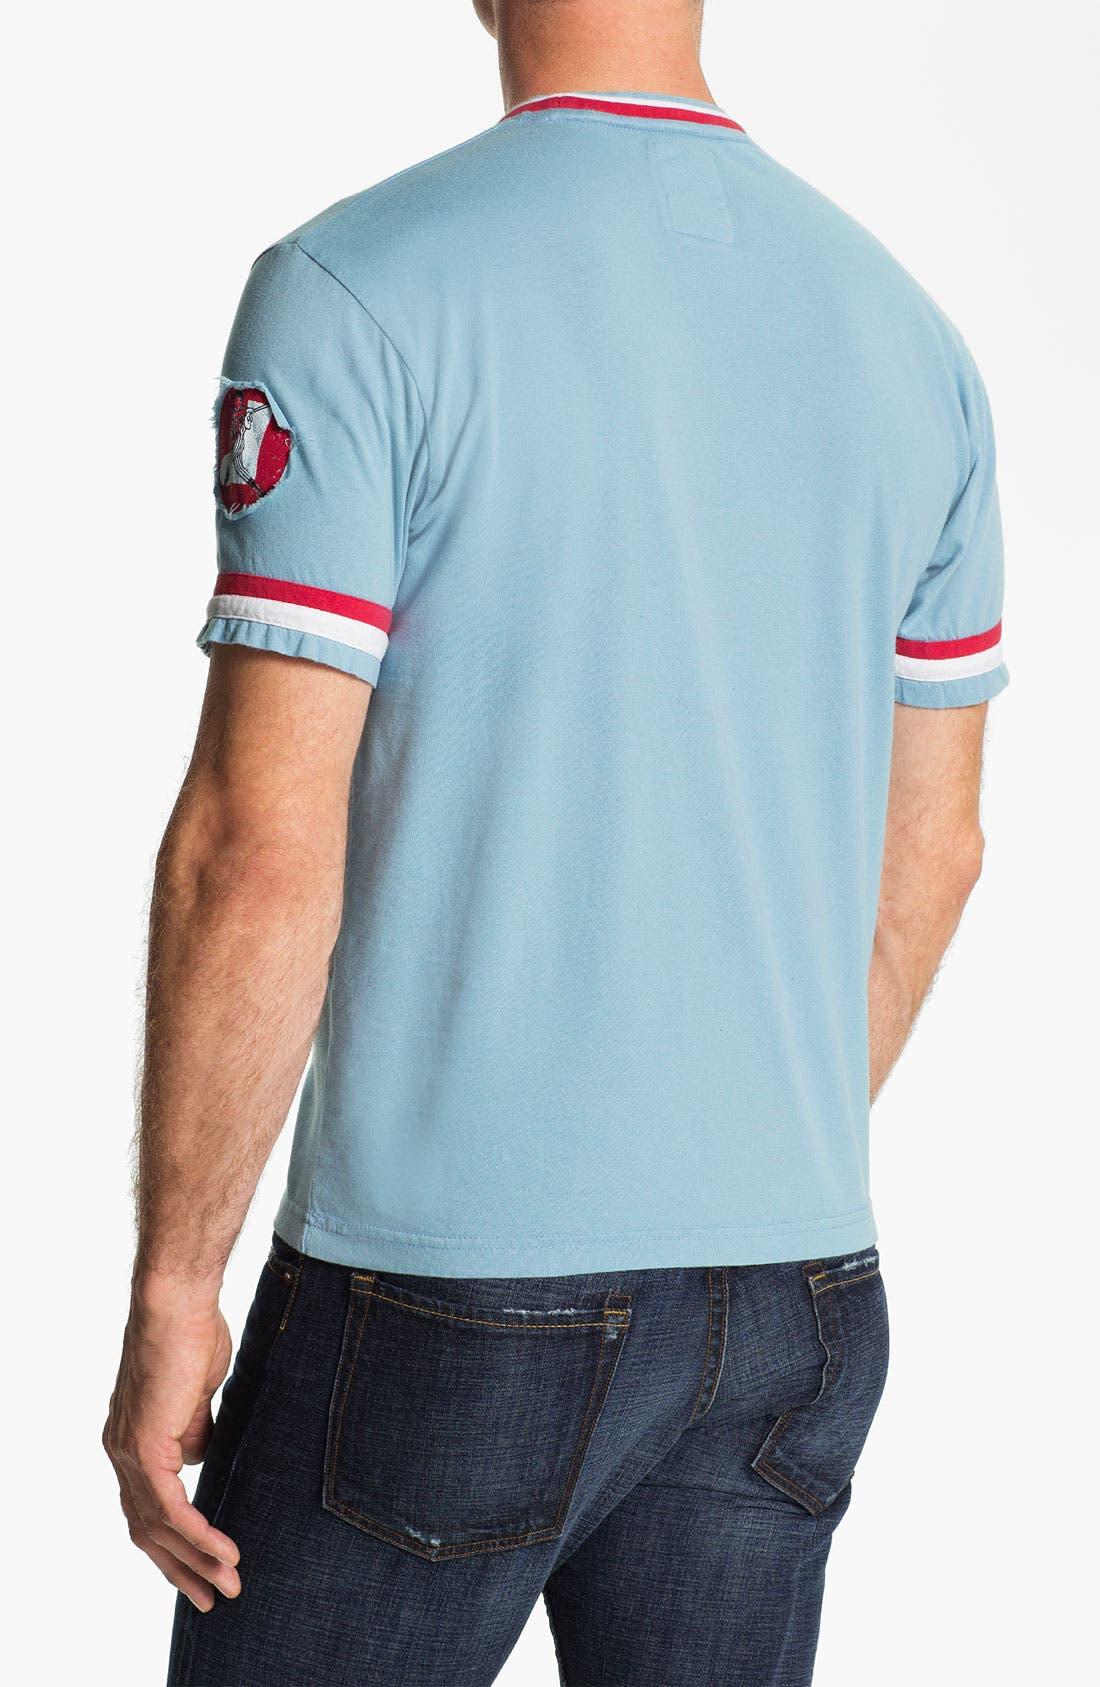 Alternate Image 2  - Red Jacket 'Chicago White Sox' Ringer Trim Fit T-Shirt (Men)